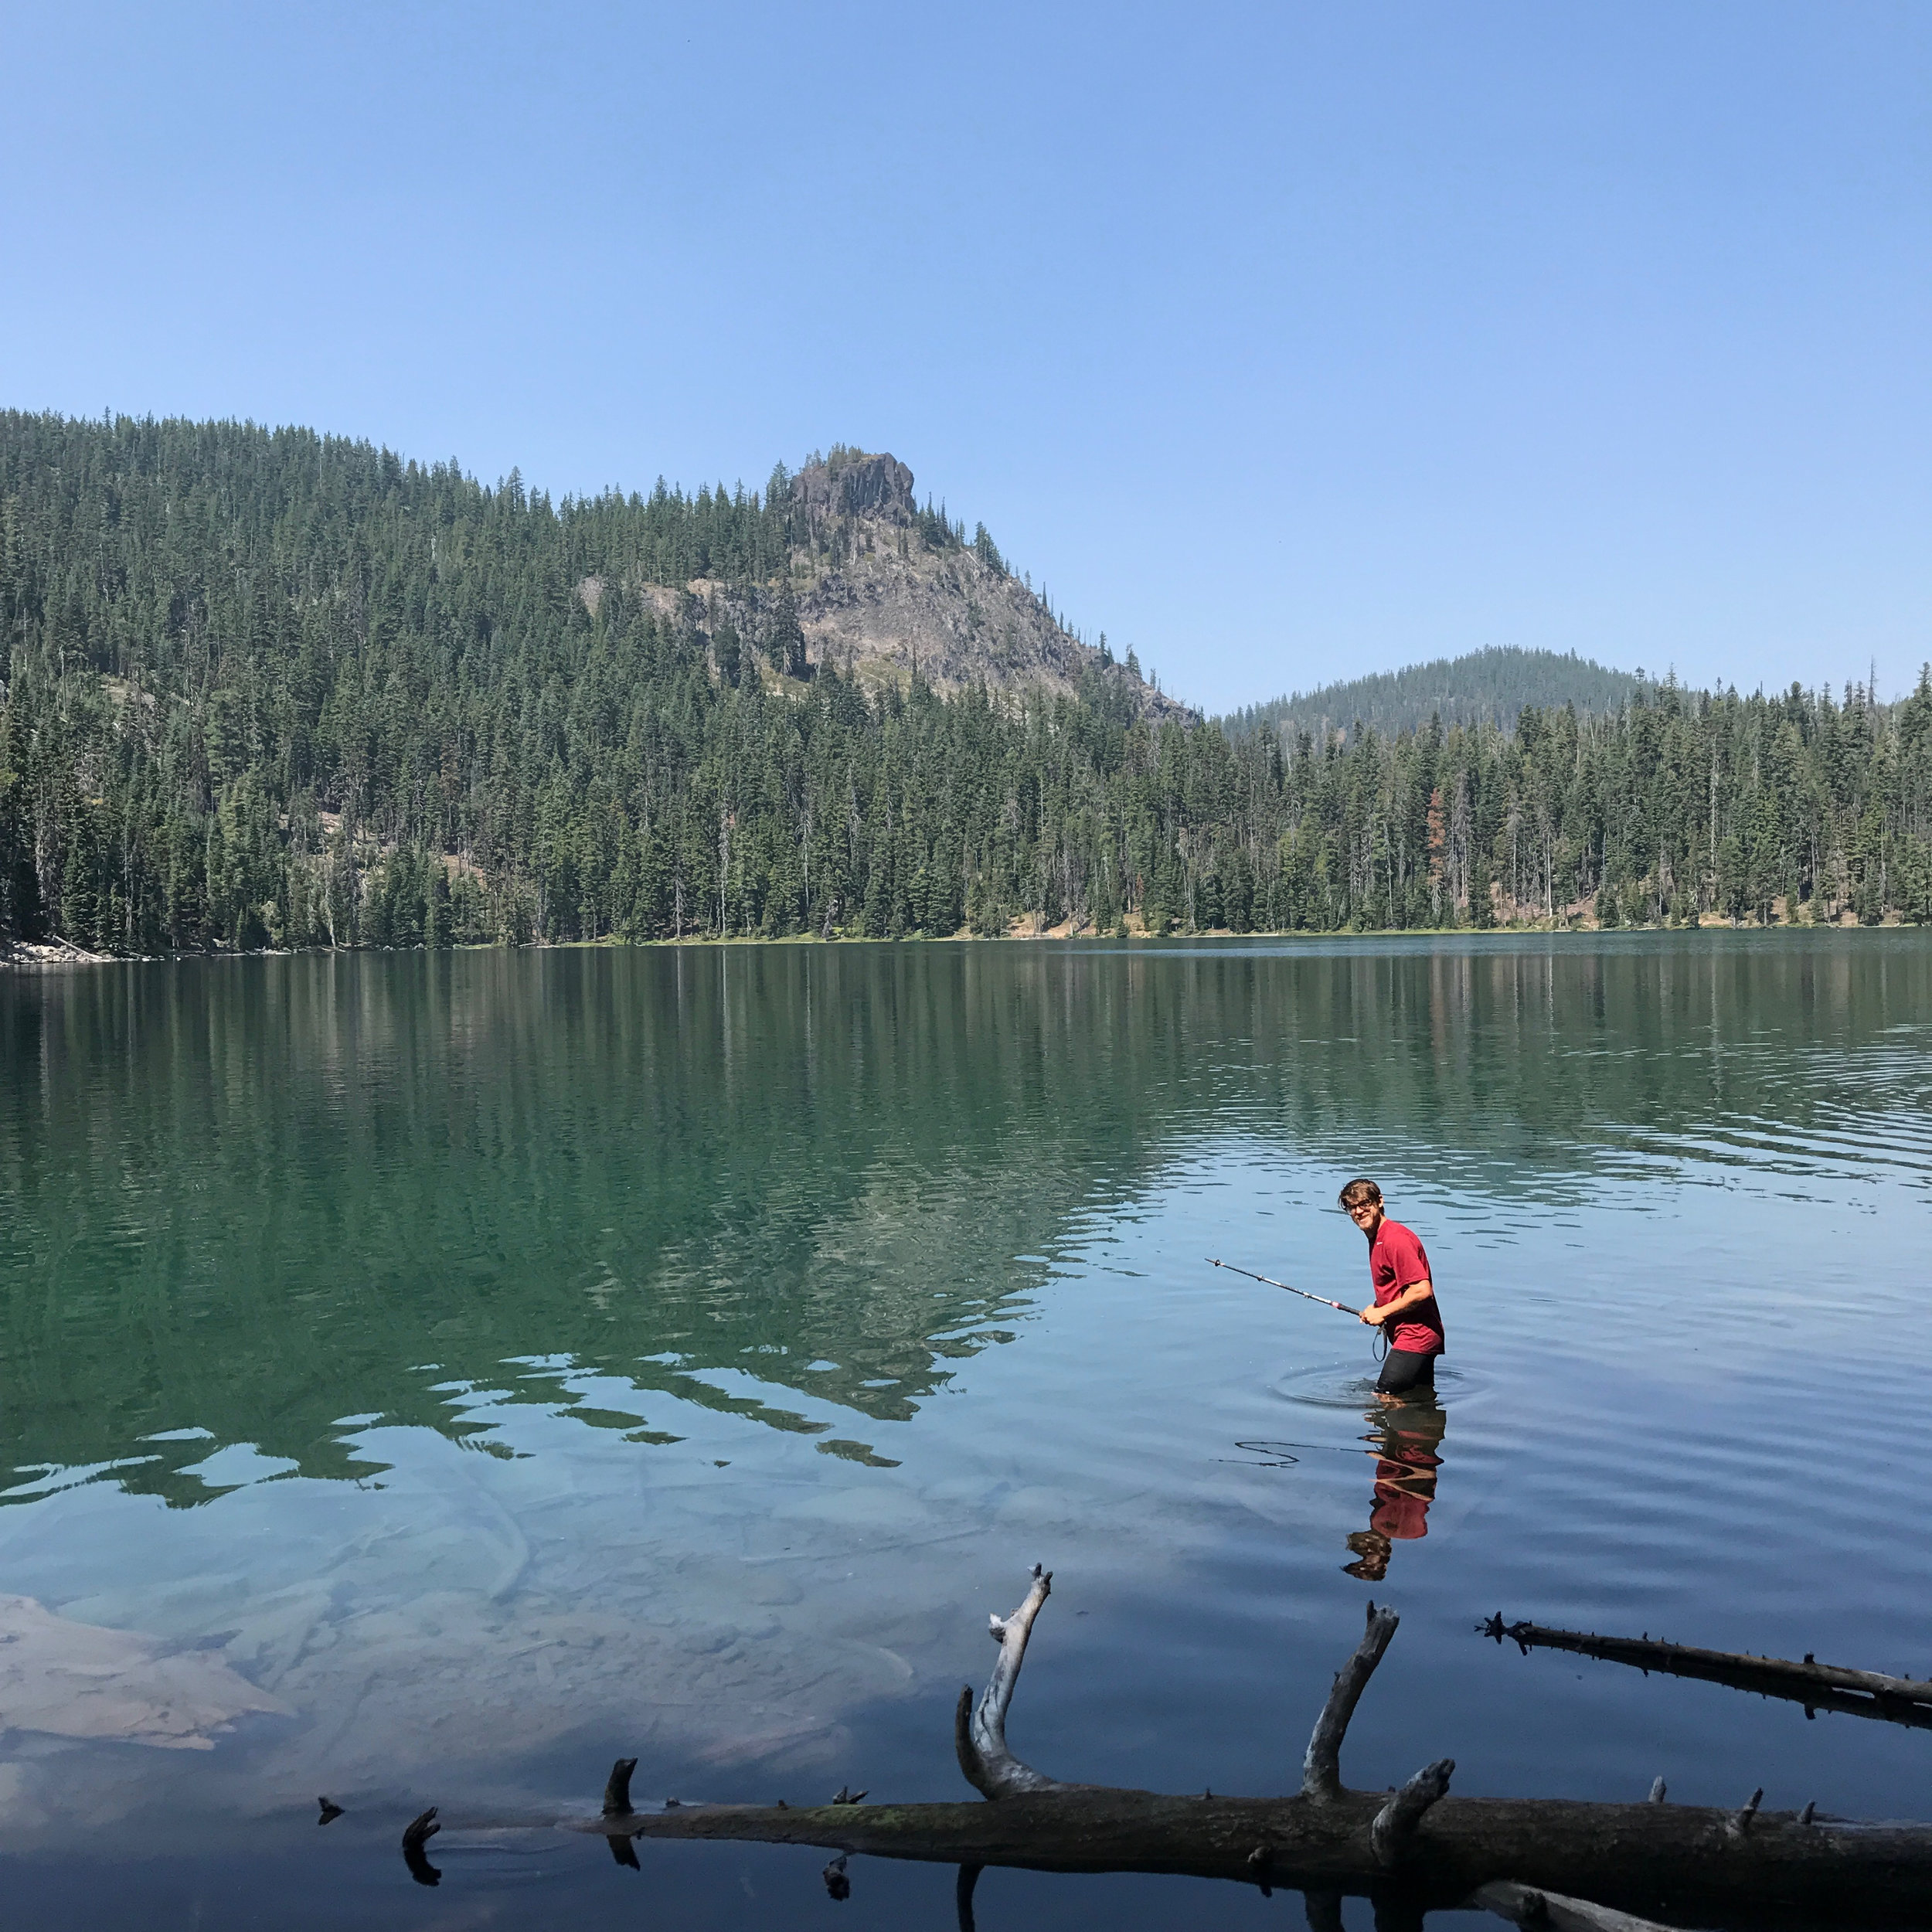 Trekking pole fishing inspired by Dean